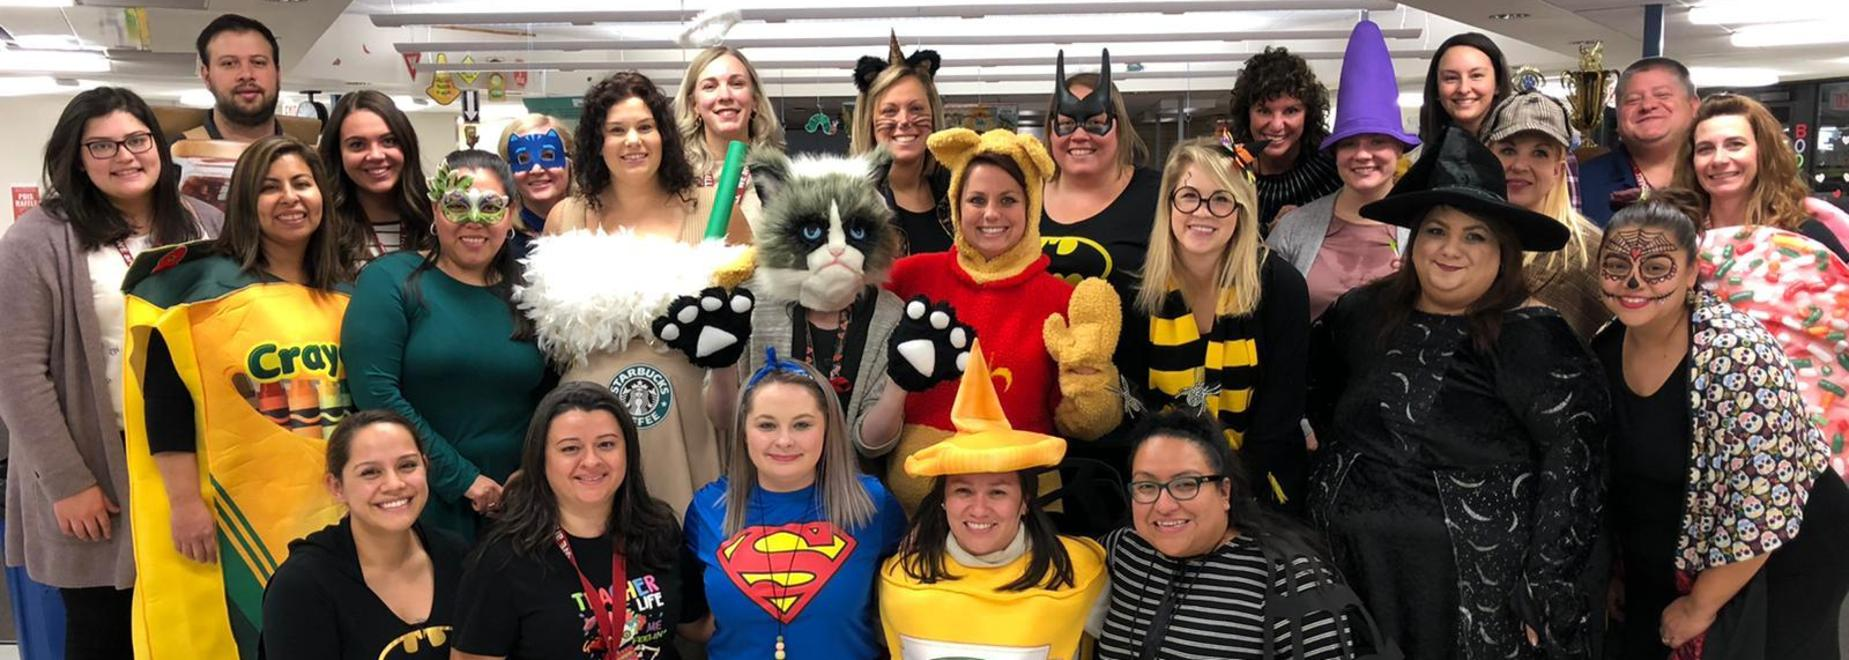 Teachers in Halloween costumes at Literacy Night